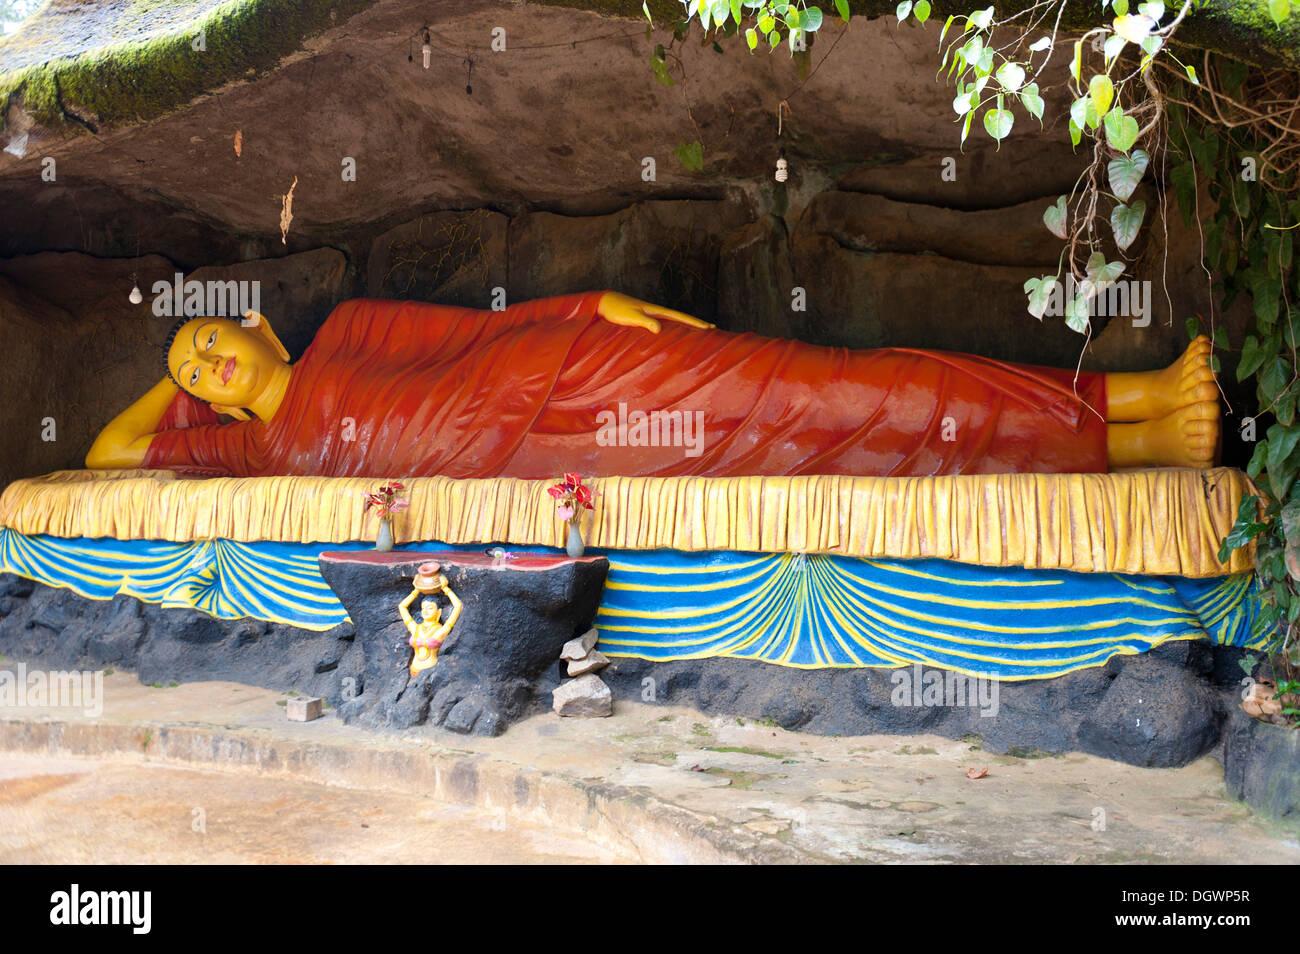 Reclining Buddha on the pilgrimsu0027 path Adamu0027s Peak Sri Pada Dalhousie Zentrales Hochland Sri Lanka & Reclining Buddha on the pilgrimsu0027 path Adamu0027s Peak Sri Pada ... islam-shia.org